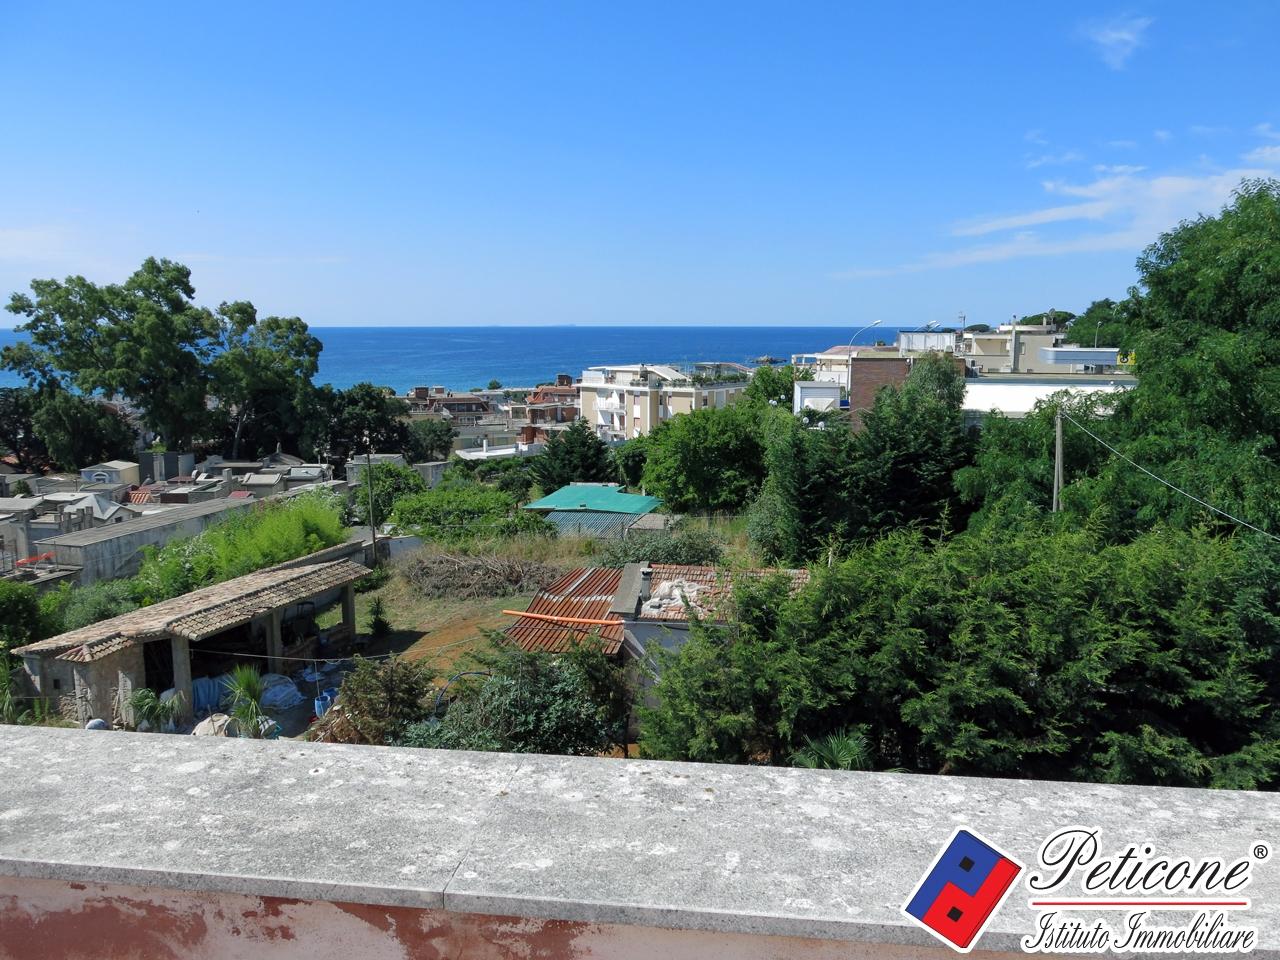 Villa in Vendita a Gaeta: 5 locali, 250 mq - Foto 17